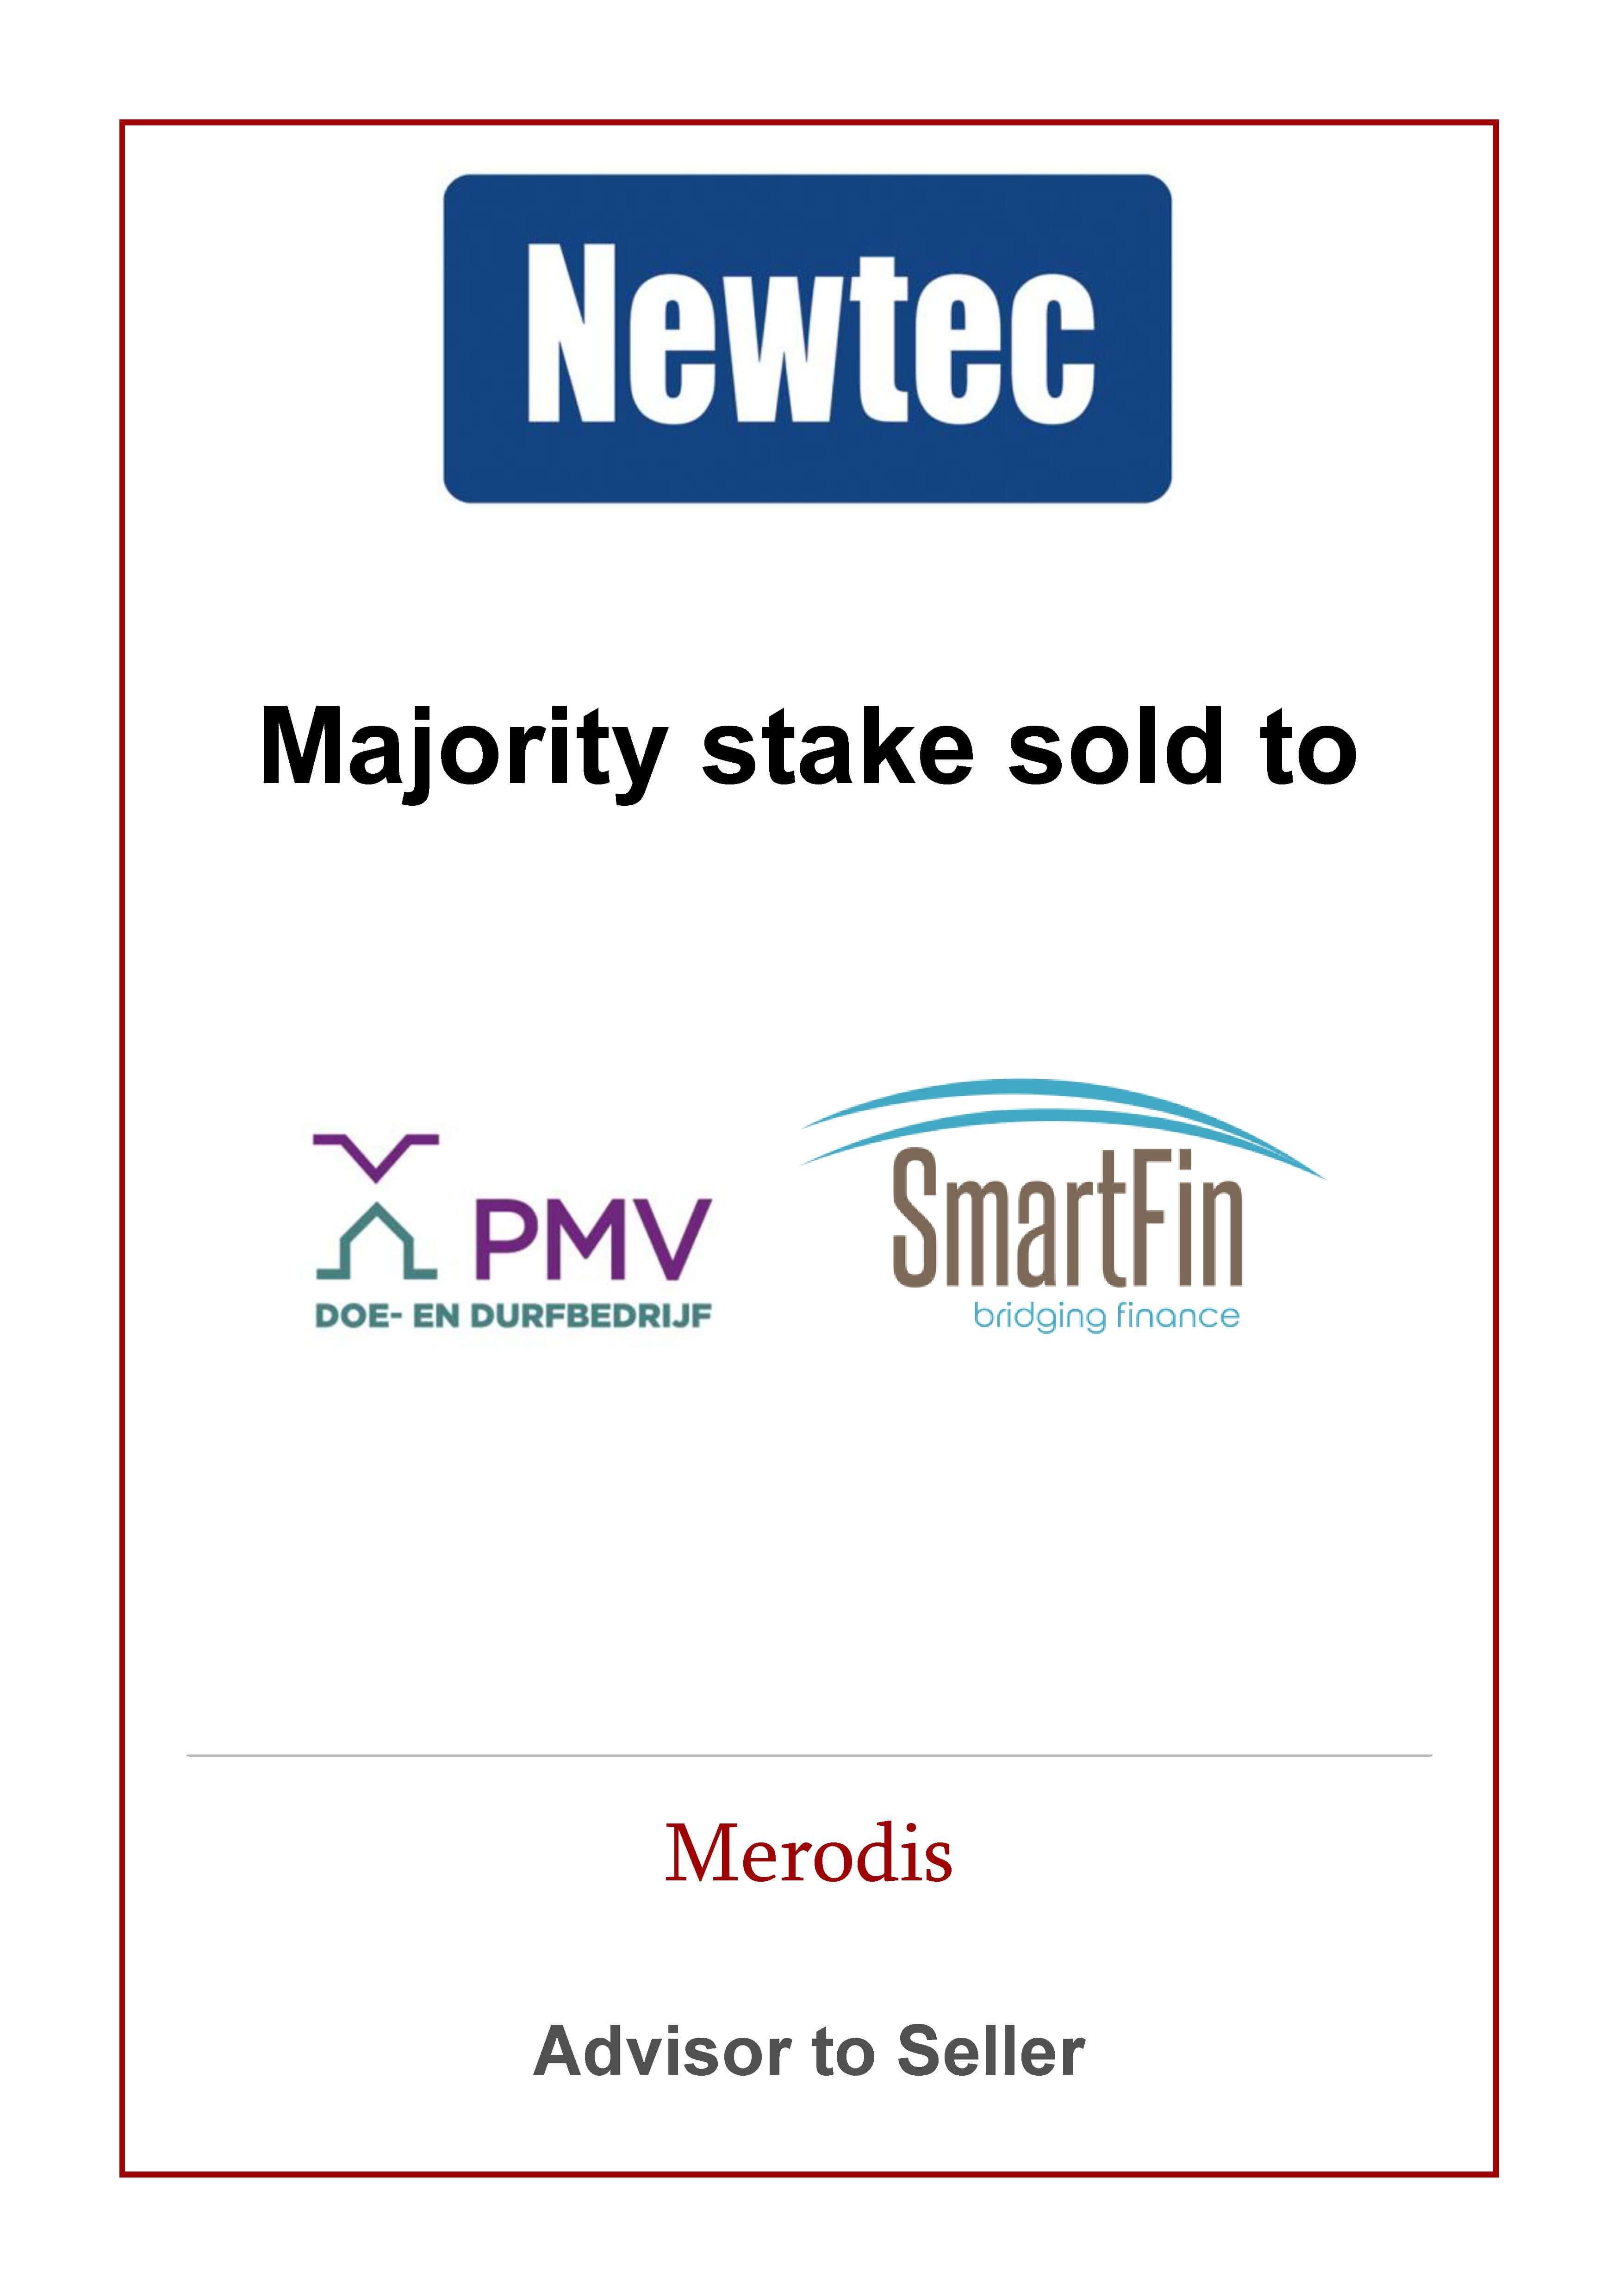 Merodis advises sale of majority stake in Newtec to PMV-Smartfin.